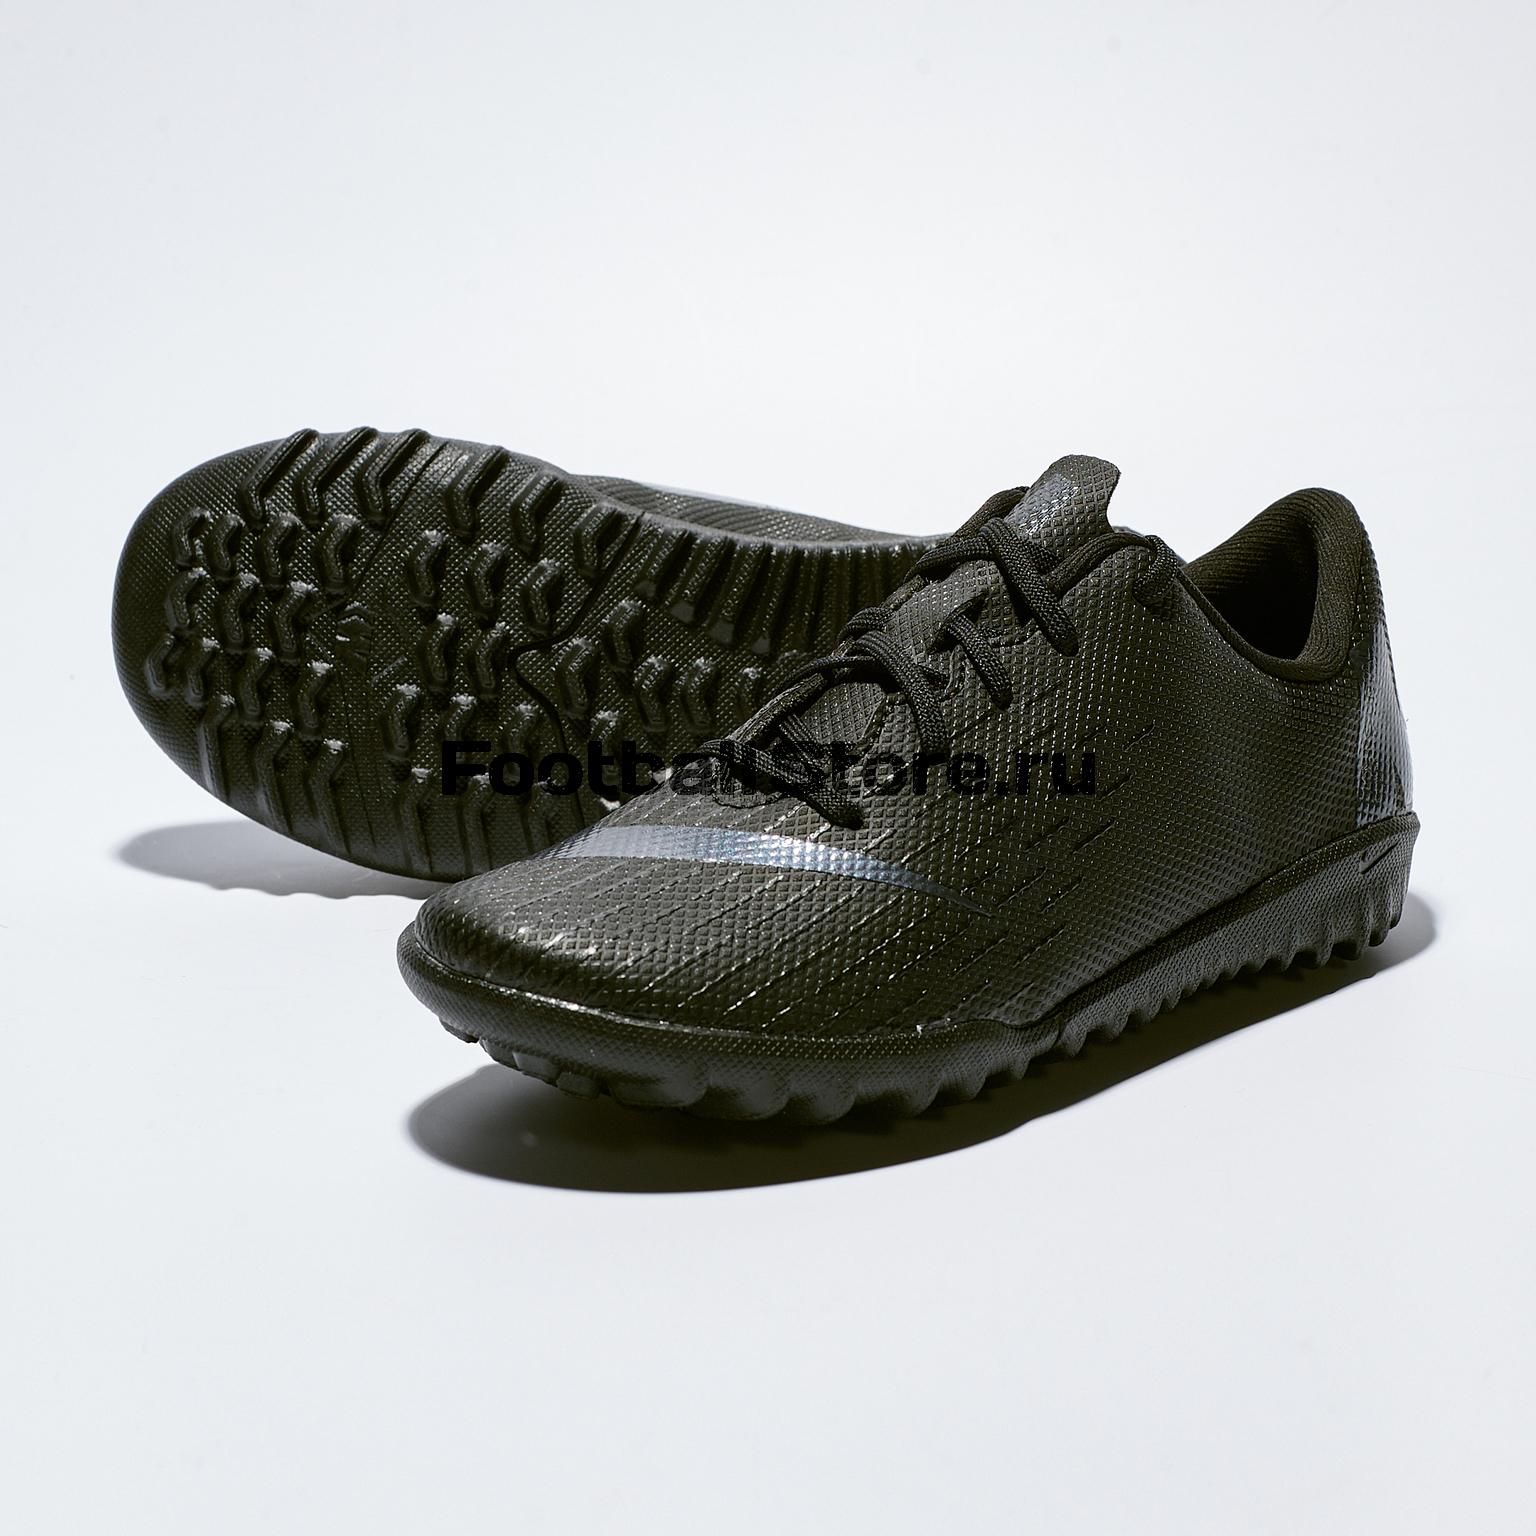 Шиповки детские Nike VaporX 12 Academy PS TF AH7353-001 цена